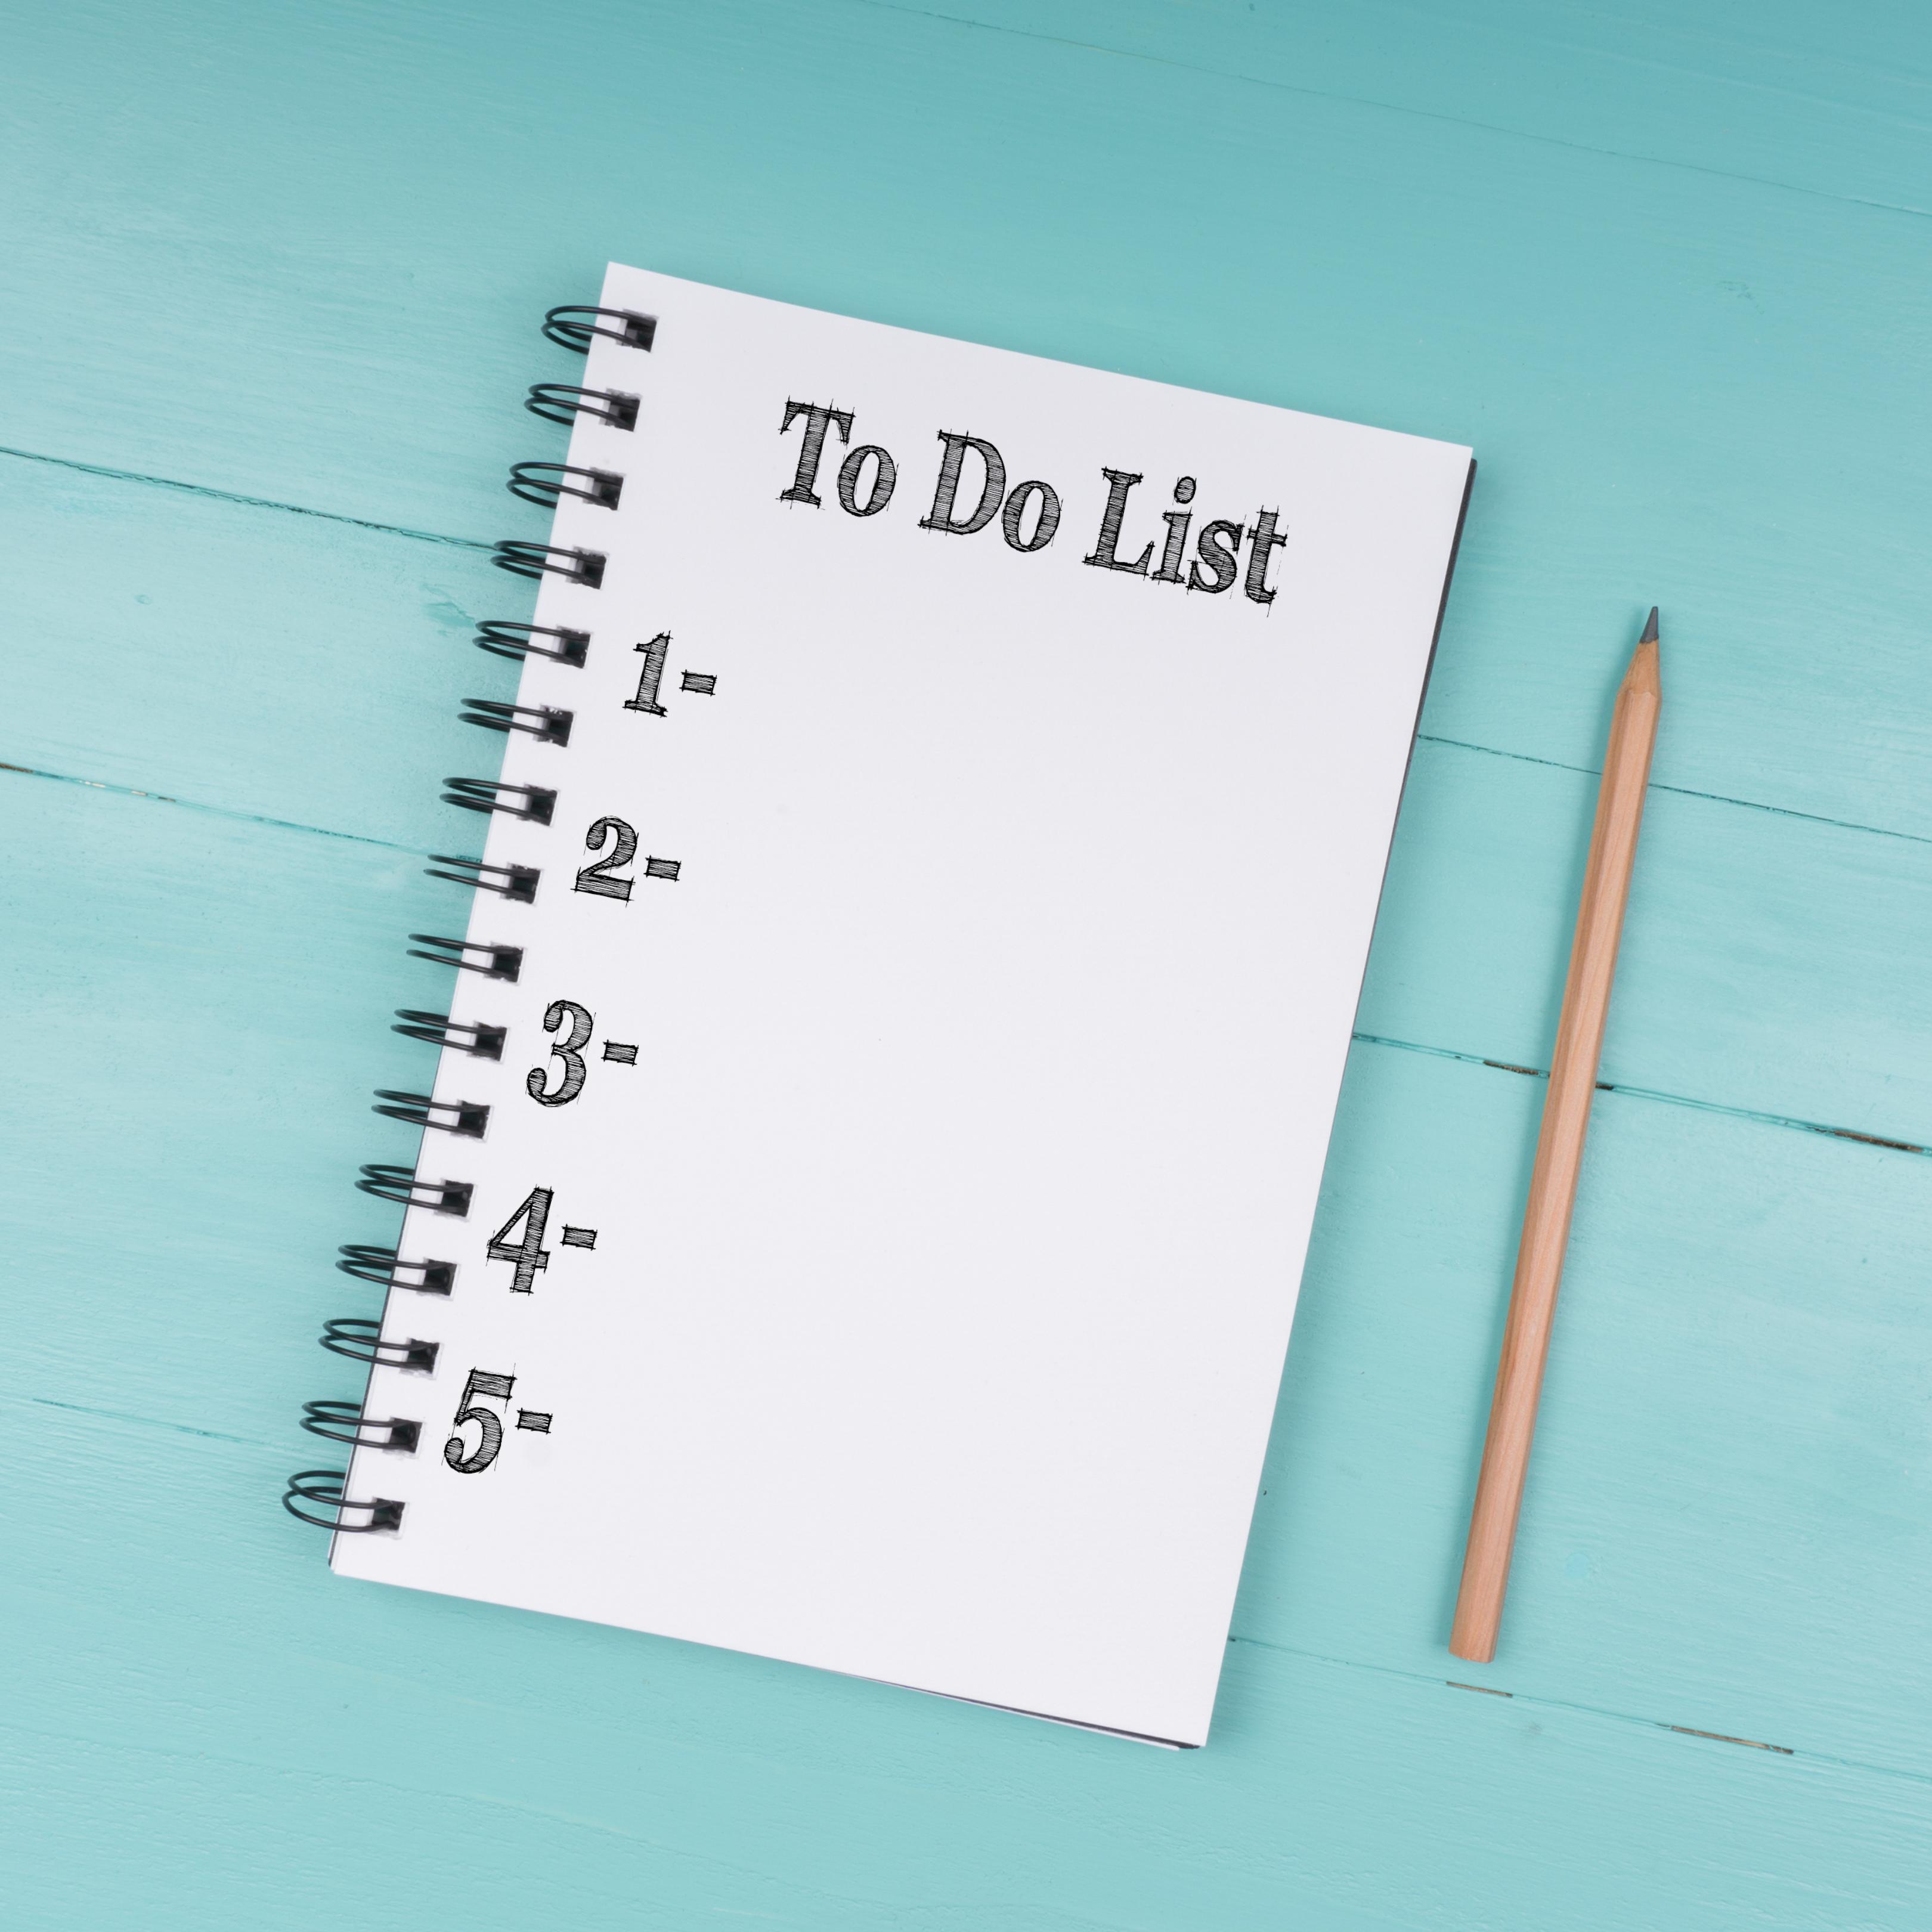 Content Ideas To Advertise On TikTok - I-Want-To-Do